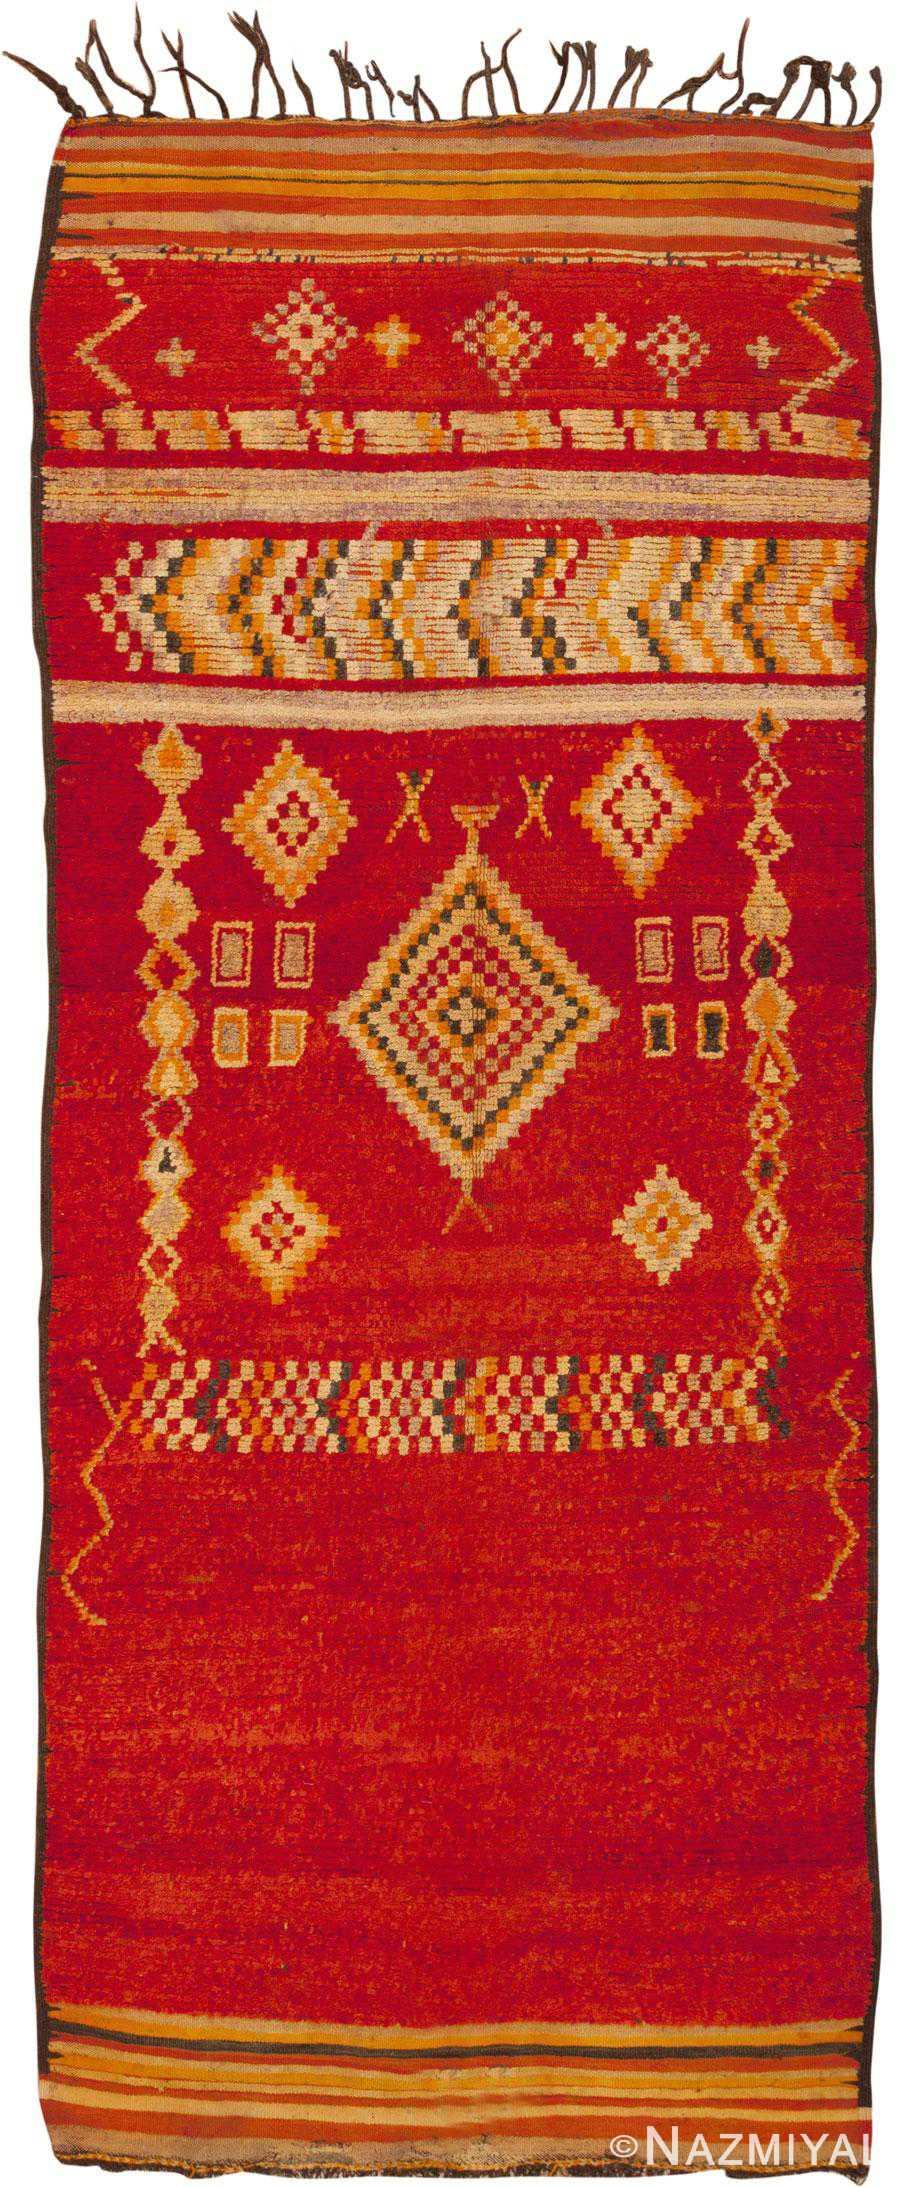 Vintage Moroccan Rug 45686 Detail/Large View